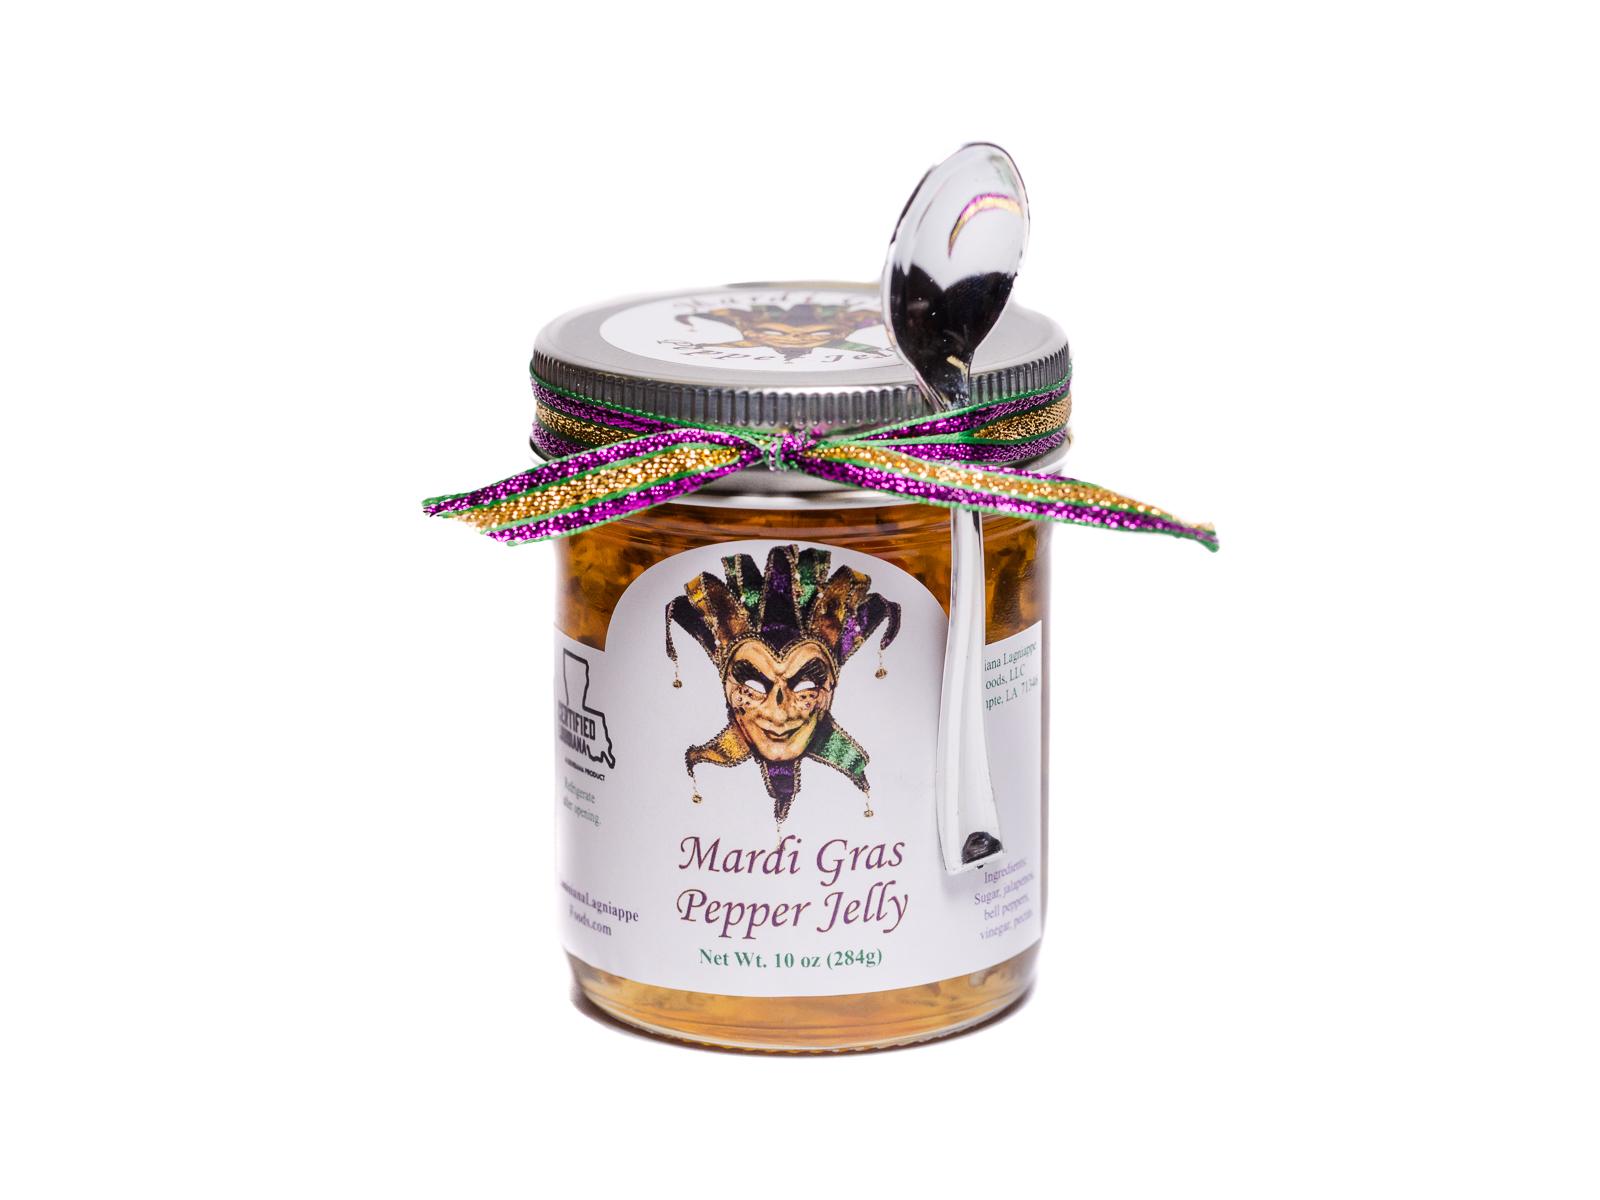 Louisiana Lagniappe Pepper Jellies, Fruit Jams, Jellies and Preserves